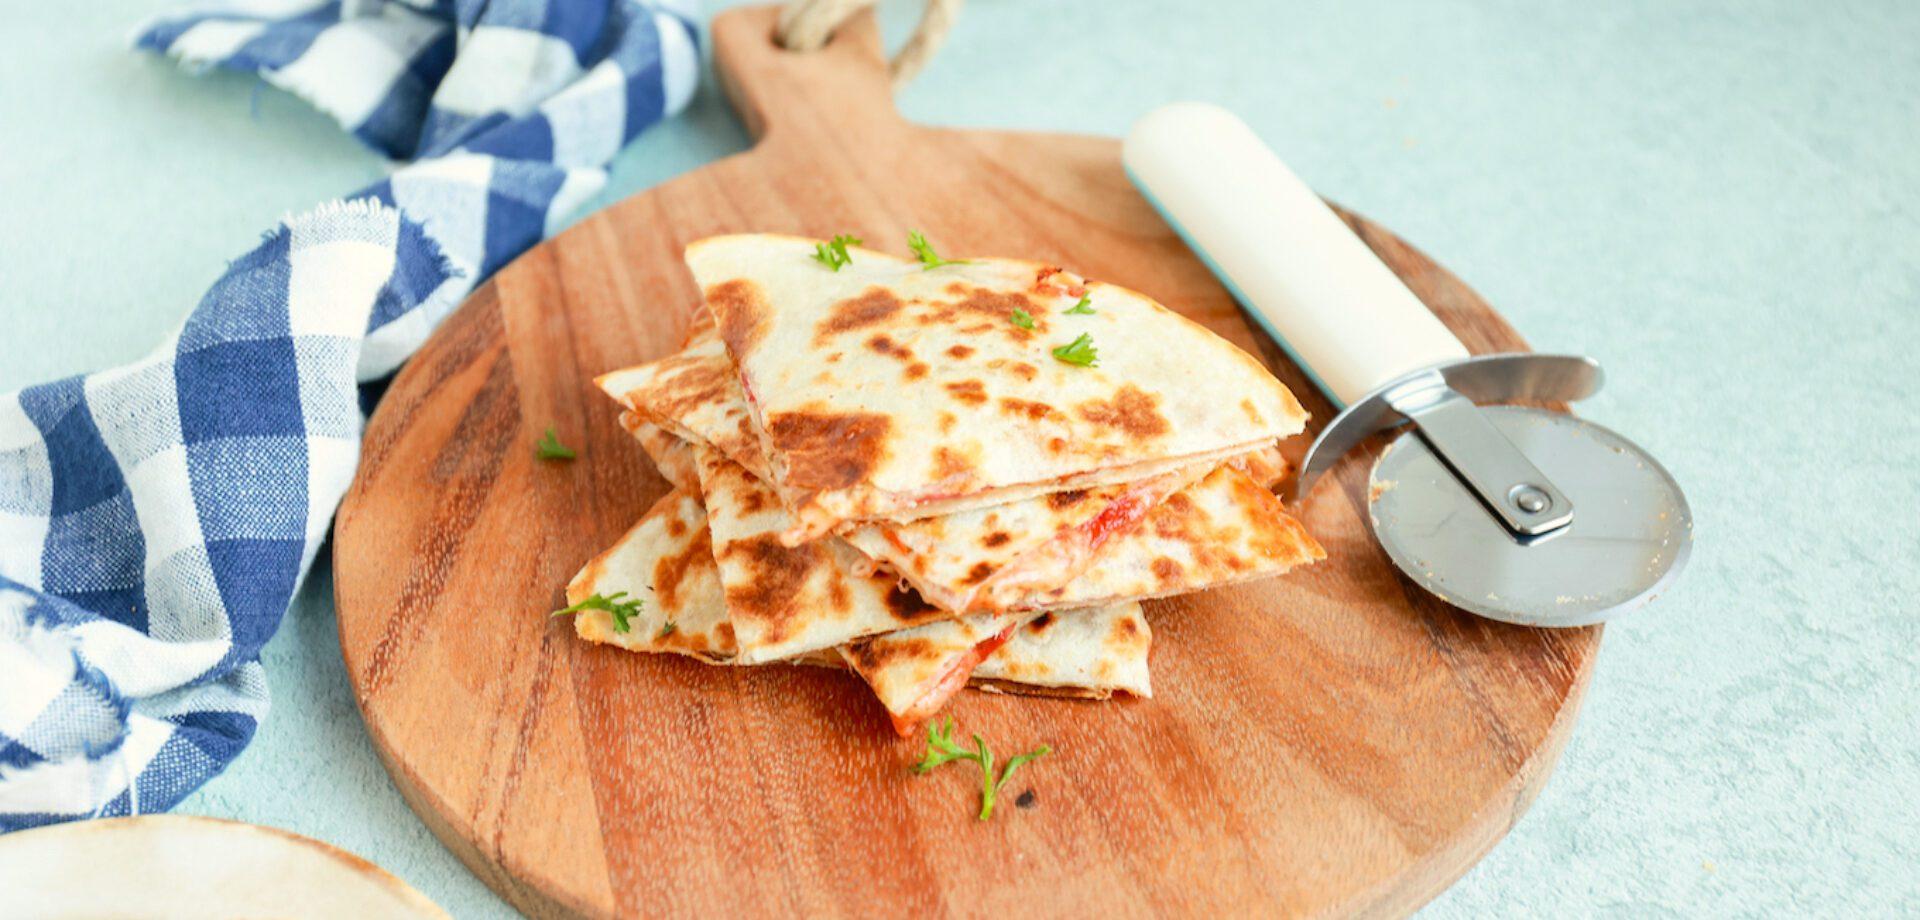 pizza quesadilla